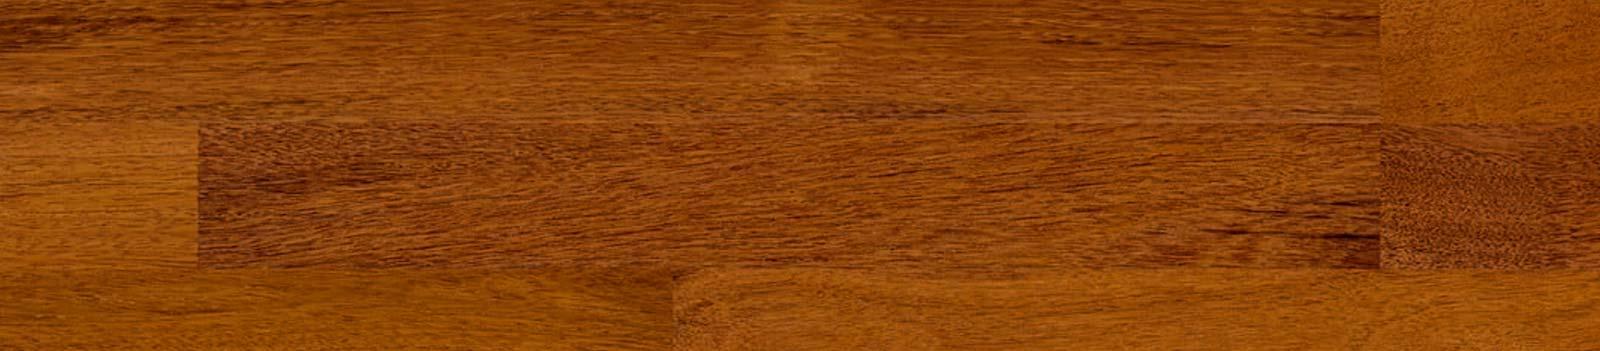 Merbau Timber